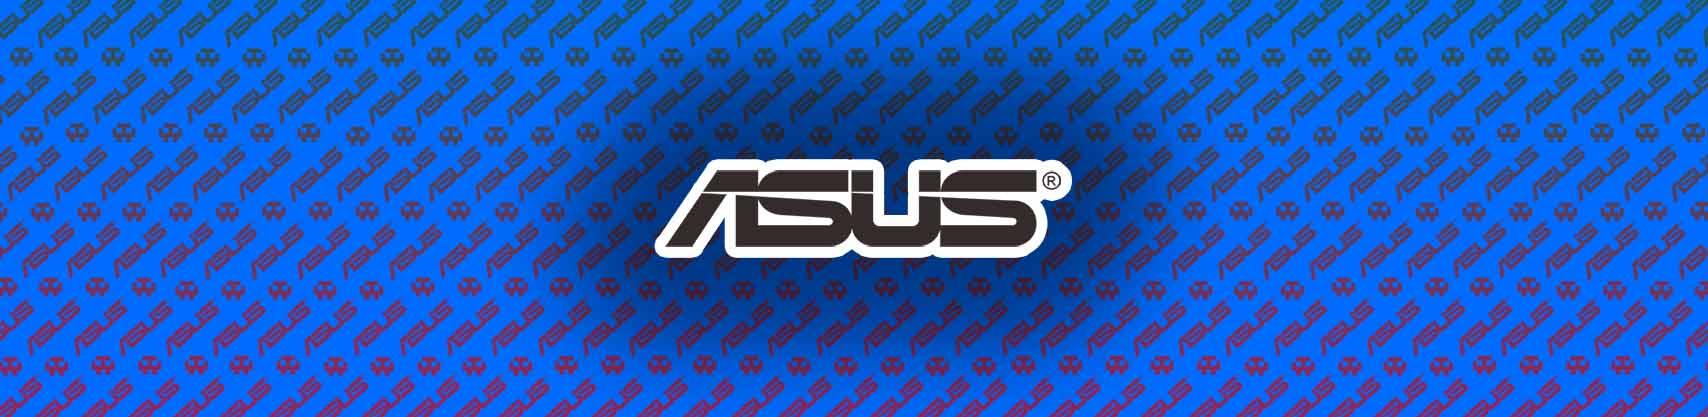 Asus M5A78L-M Plus/USB3 Manual